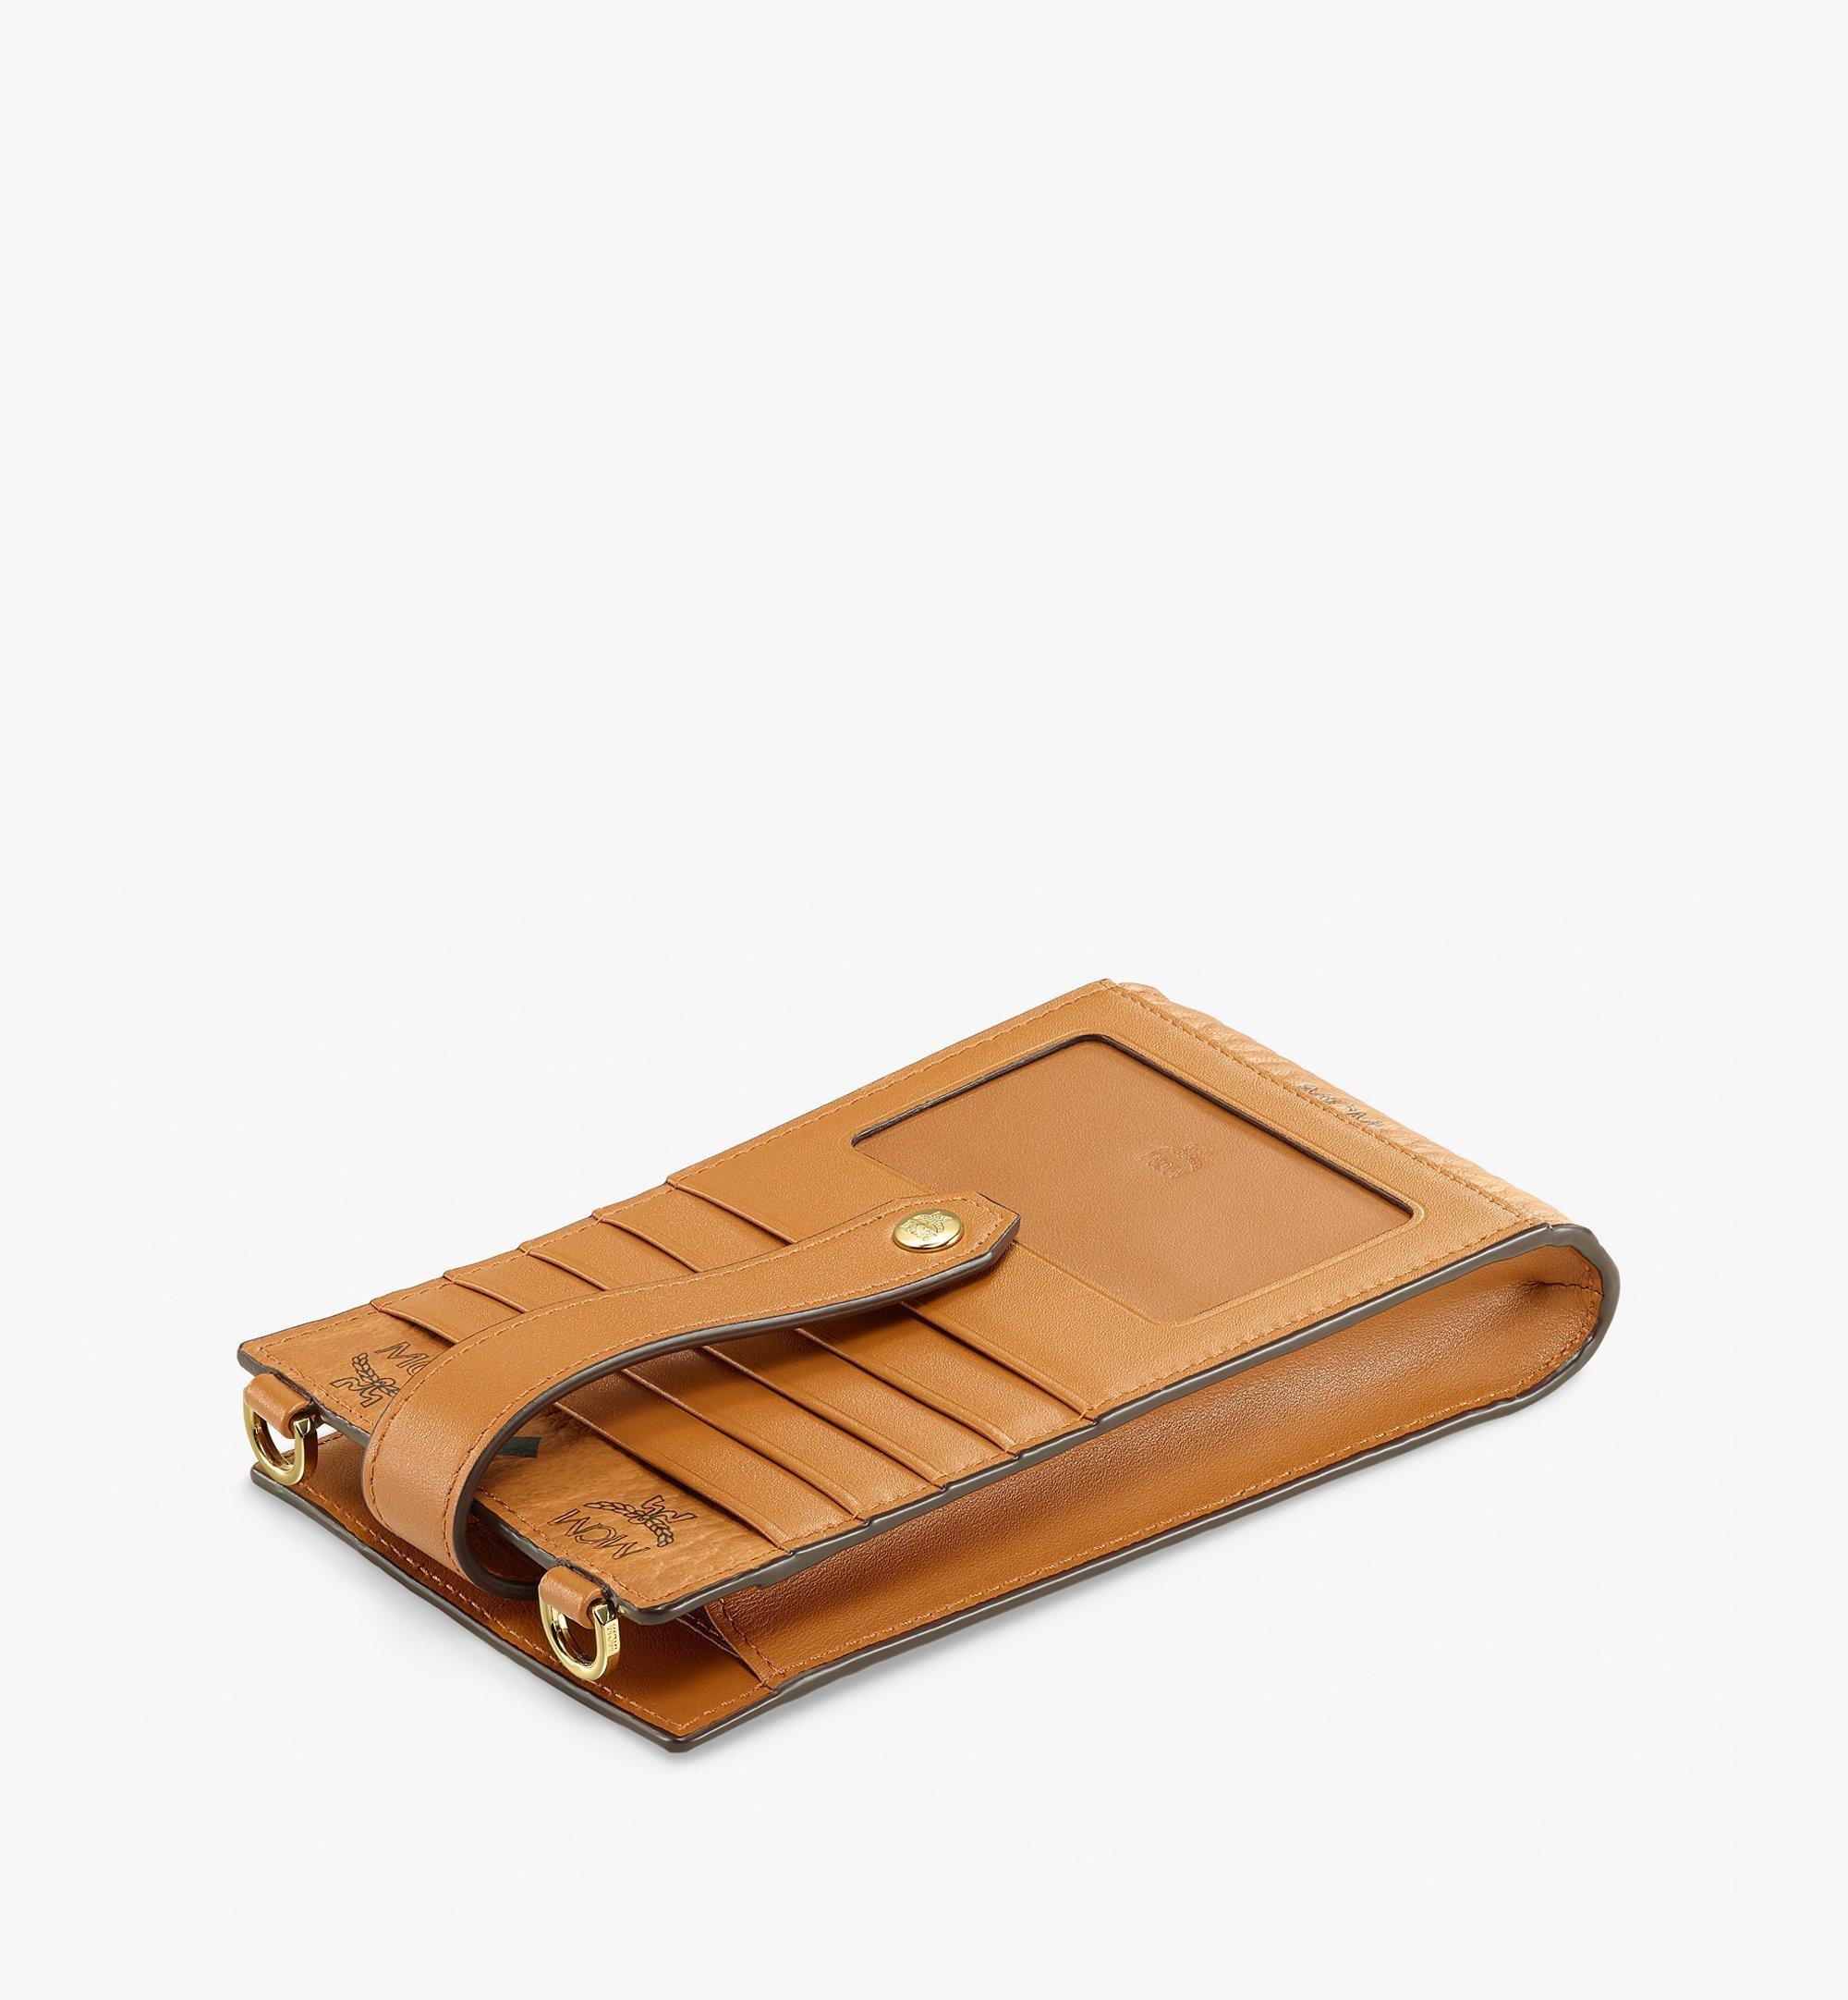 MCM Multifunction Phone Case in Visetos Original Cognac MXZBSVI01CO001 Alternate View 1